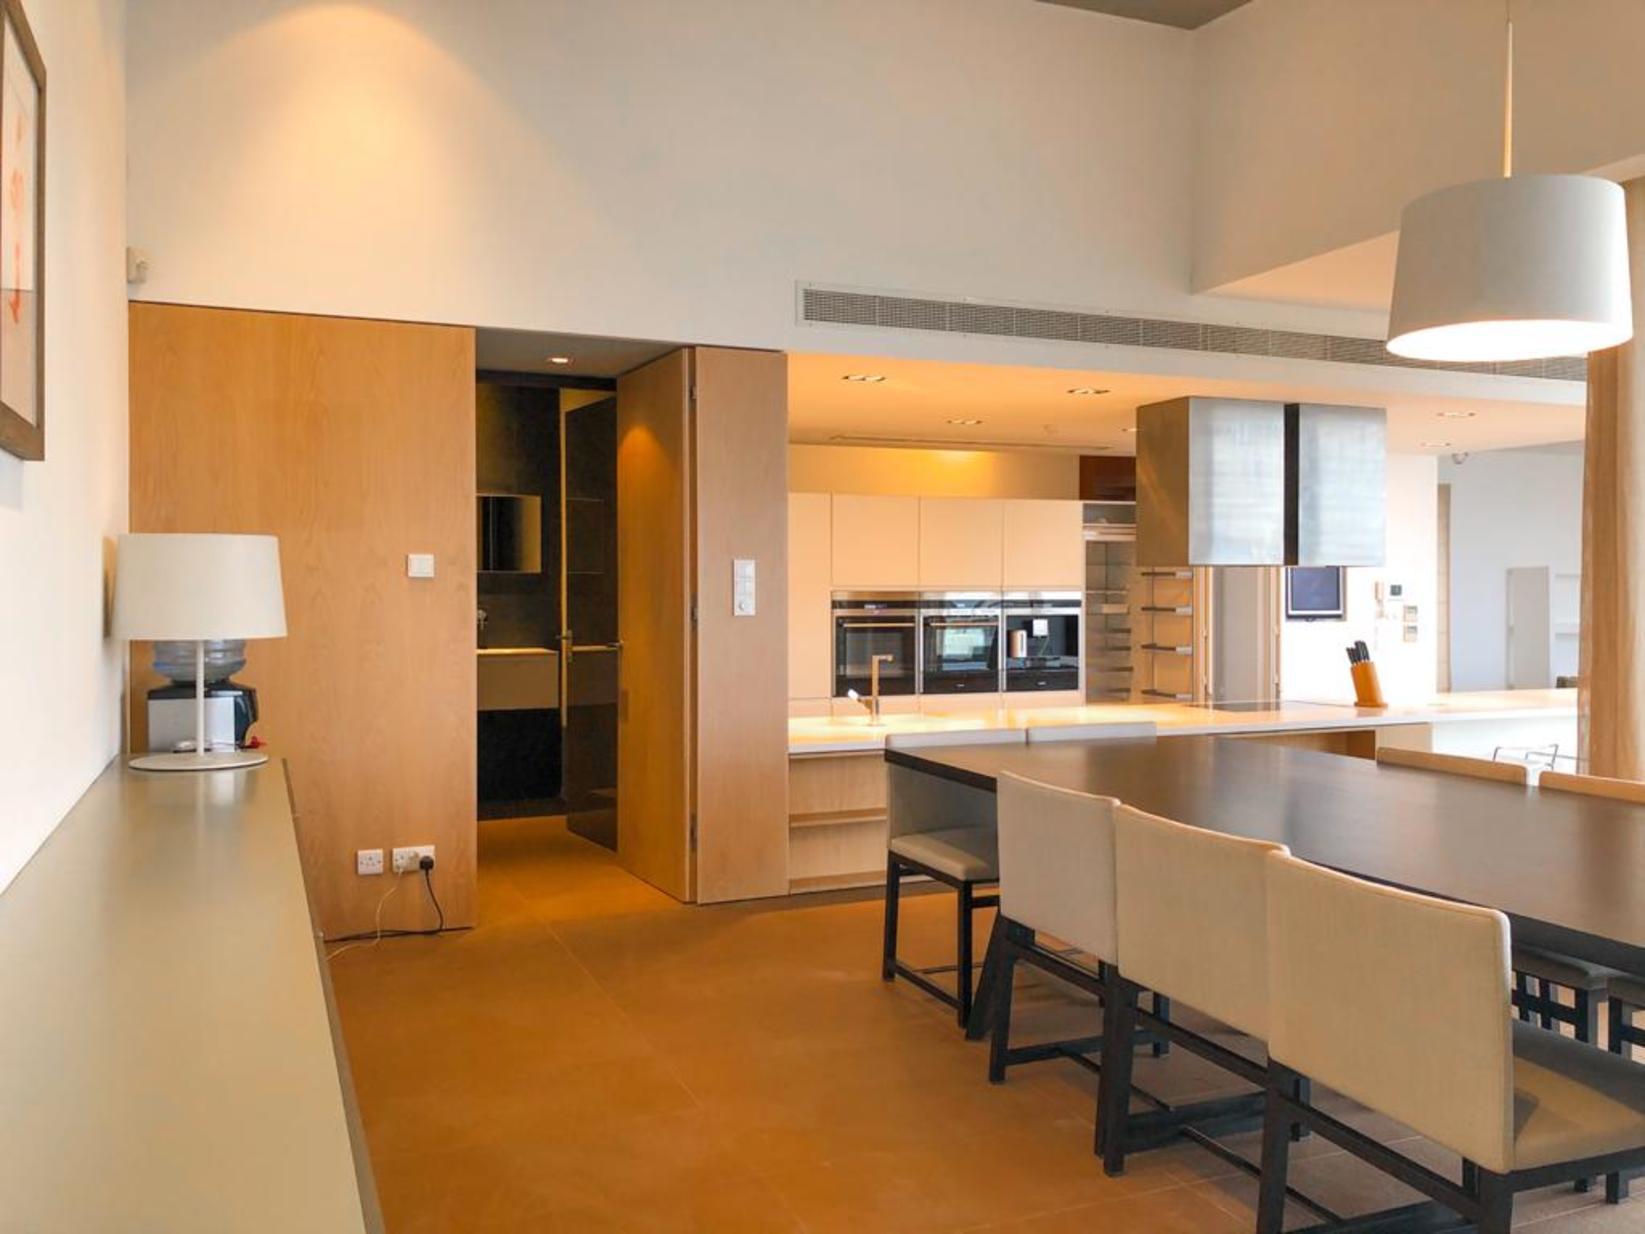 3 bed Villa For Rent in Bahar ic-Caghaq, Bahar ic-Caghaq - thumb 14